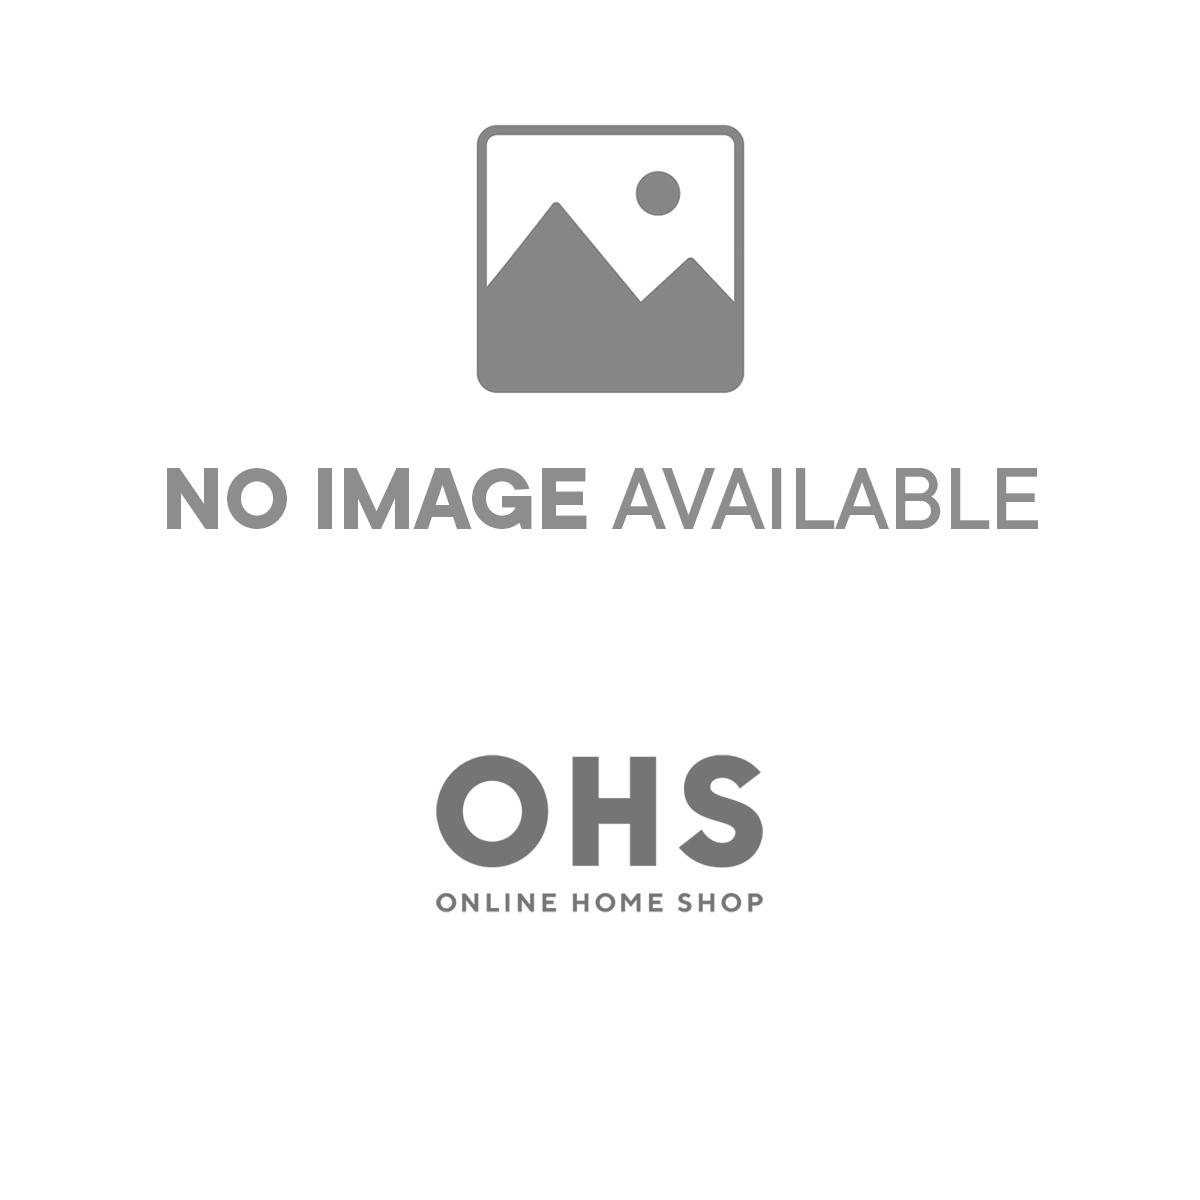 Emma Diamante Top Voiles 55X87 Charcoal